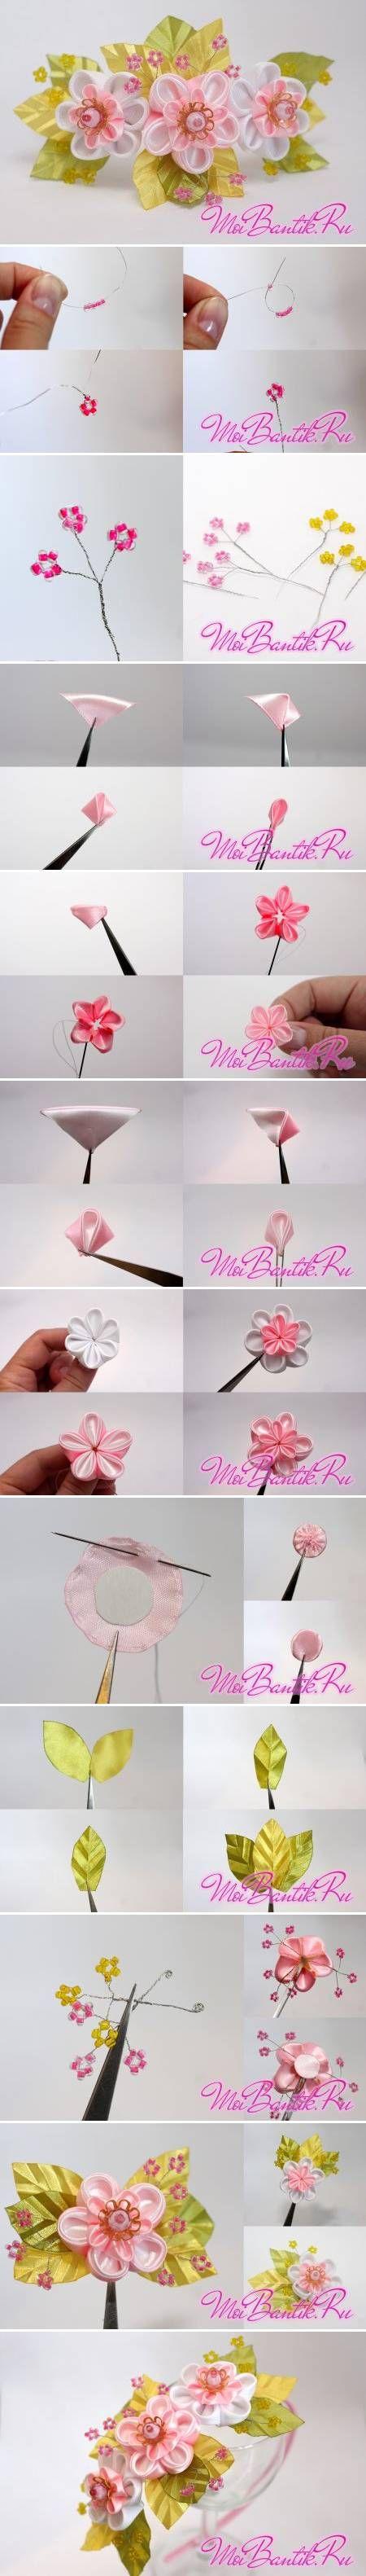 DIY Golden Sakura Ribbon Flower DIY Golden Sakura Ribbon Flower.....(omGEE!...love, LOVE this tutorial and the end result! HAVE TO try it out!!)....